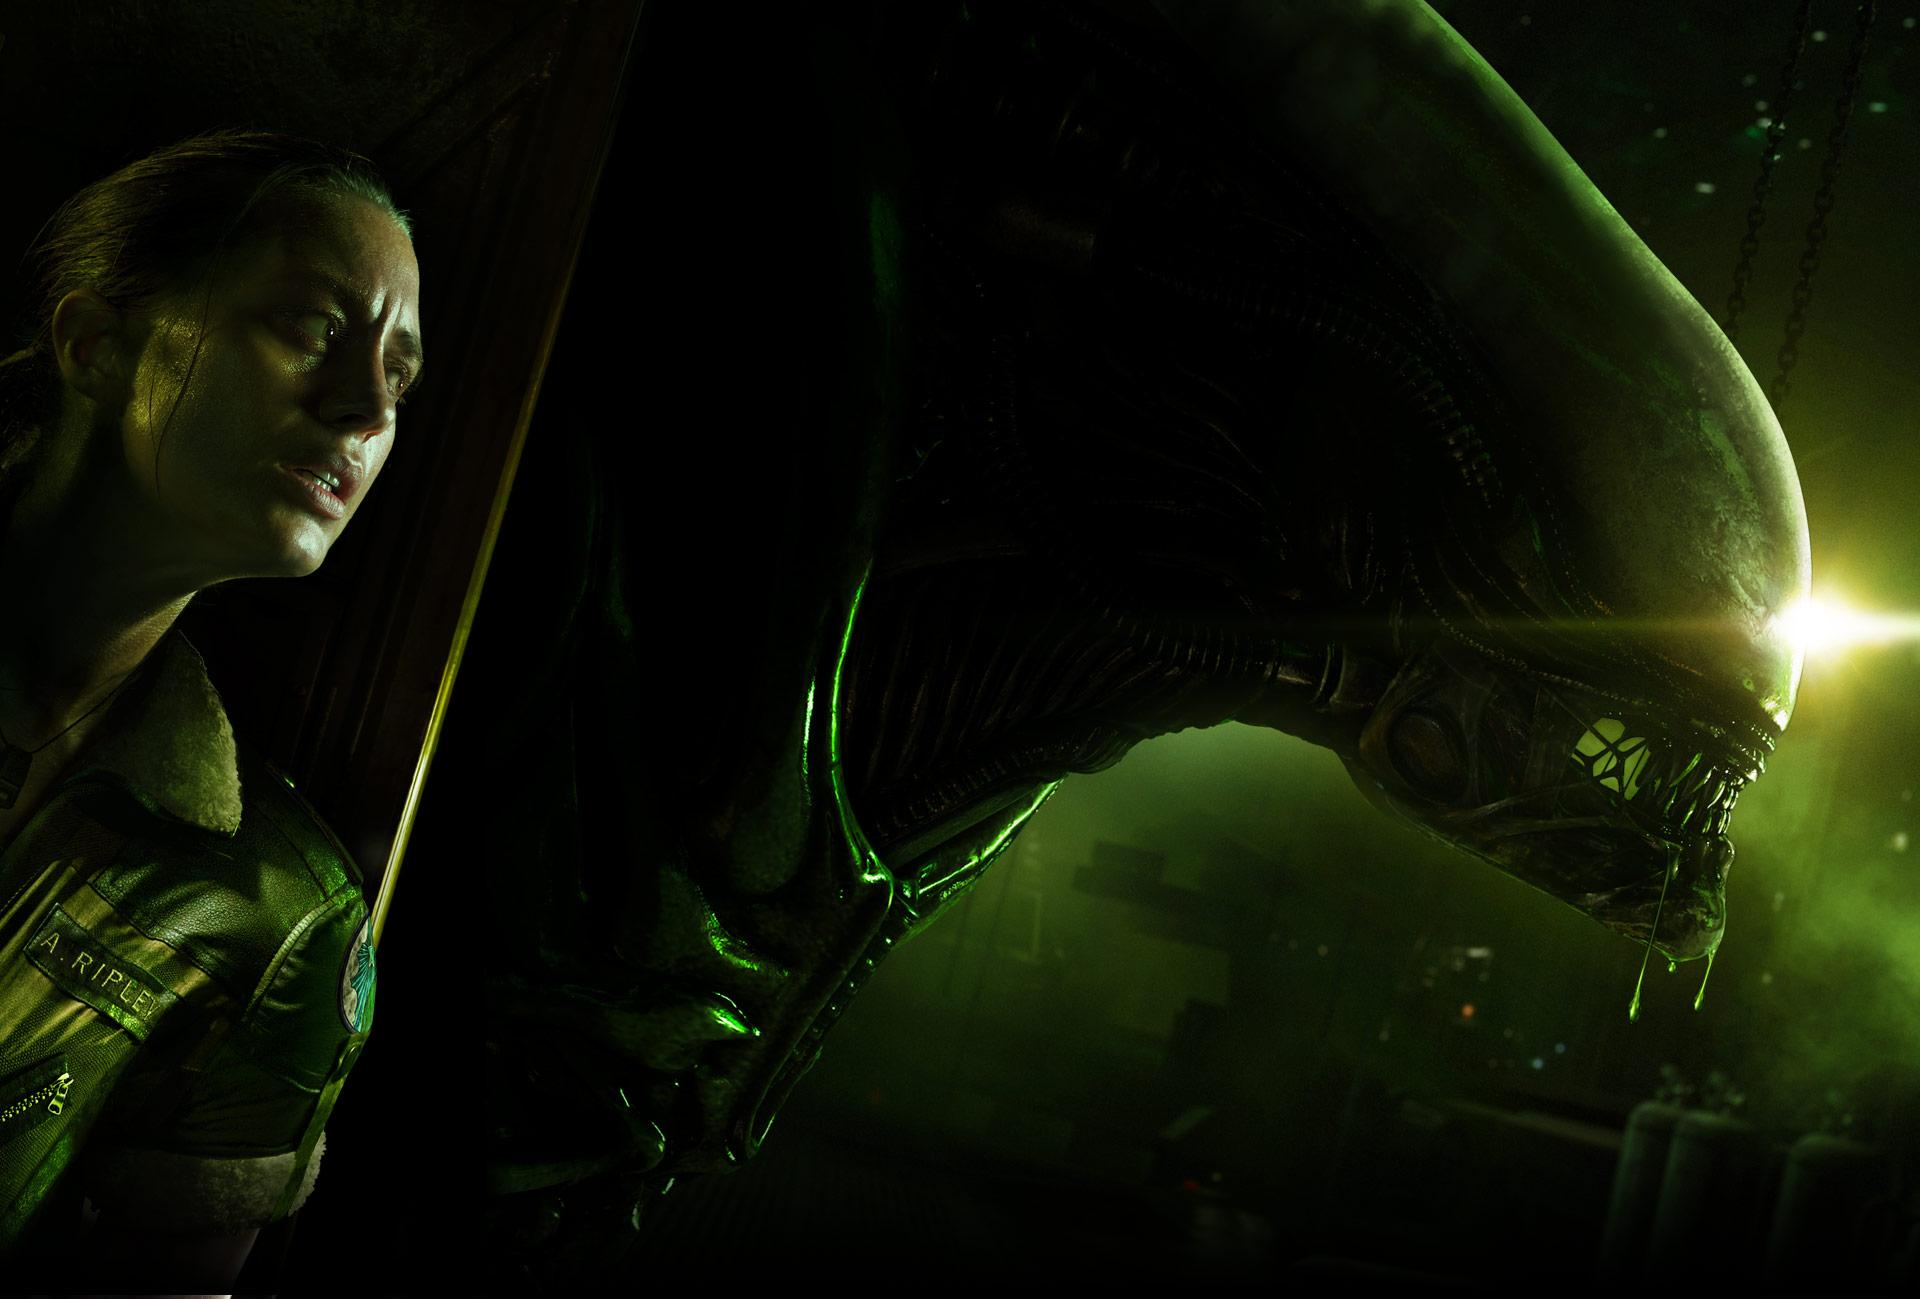 Jeu Vidéo - Alien: Isolation